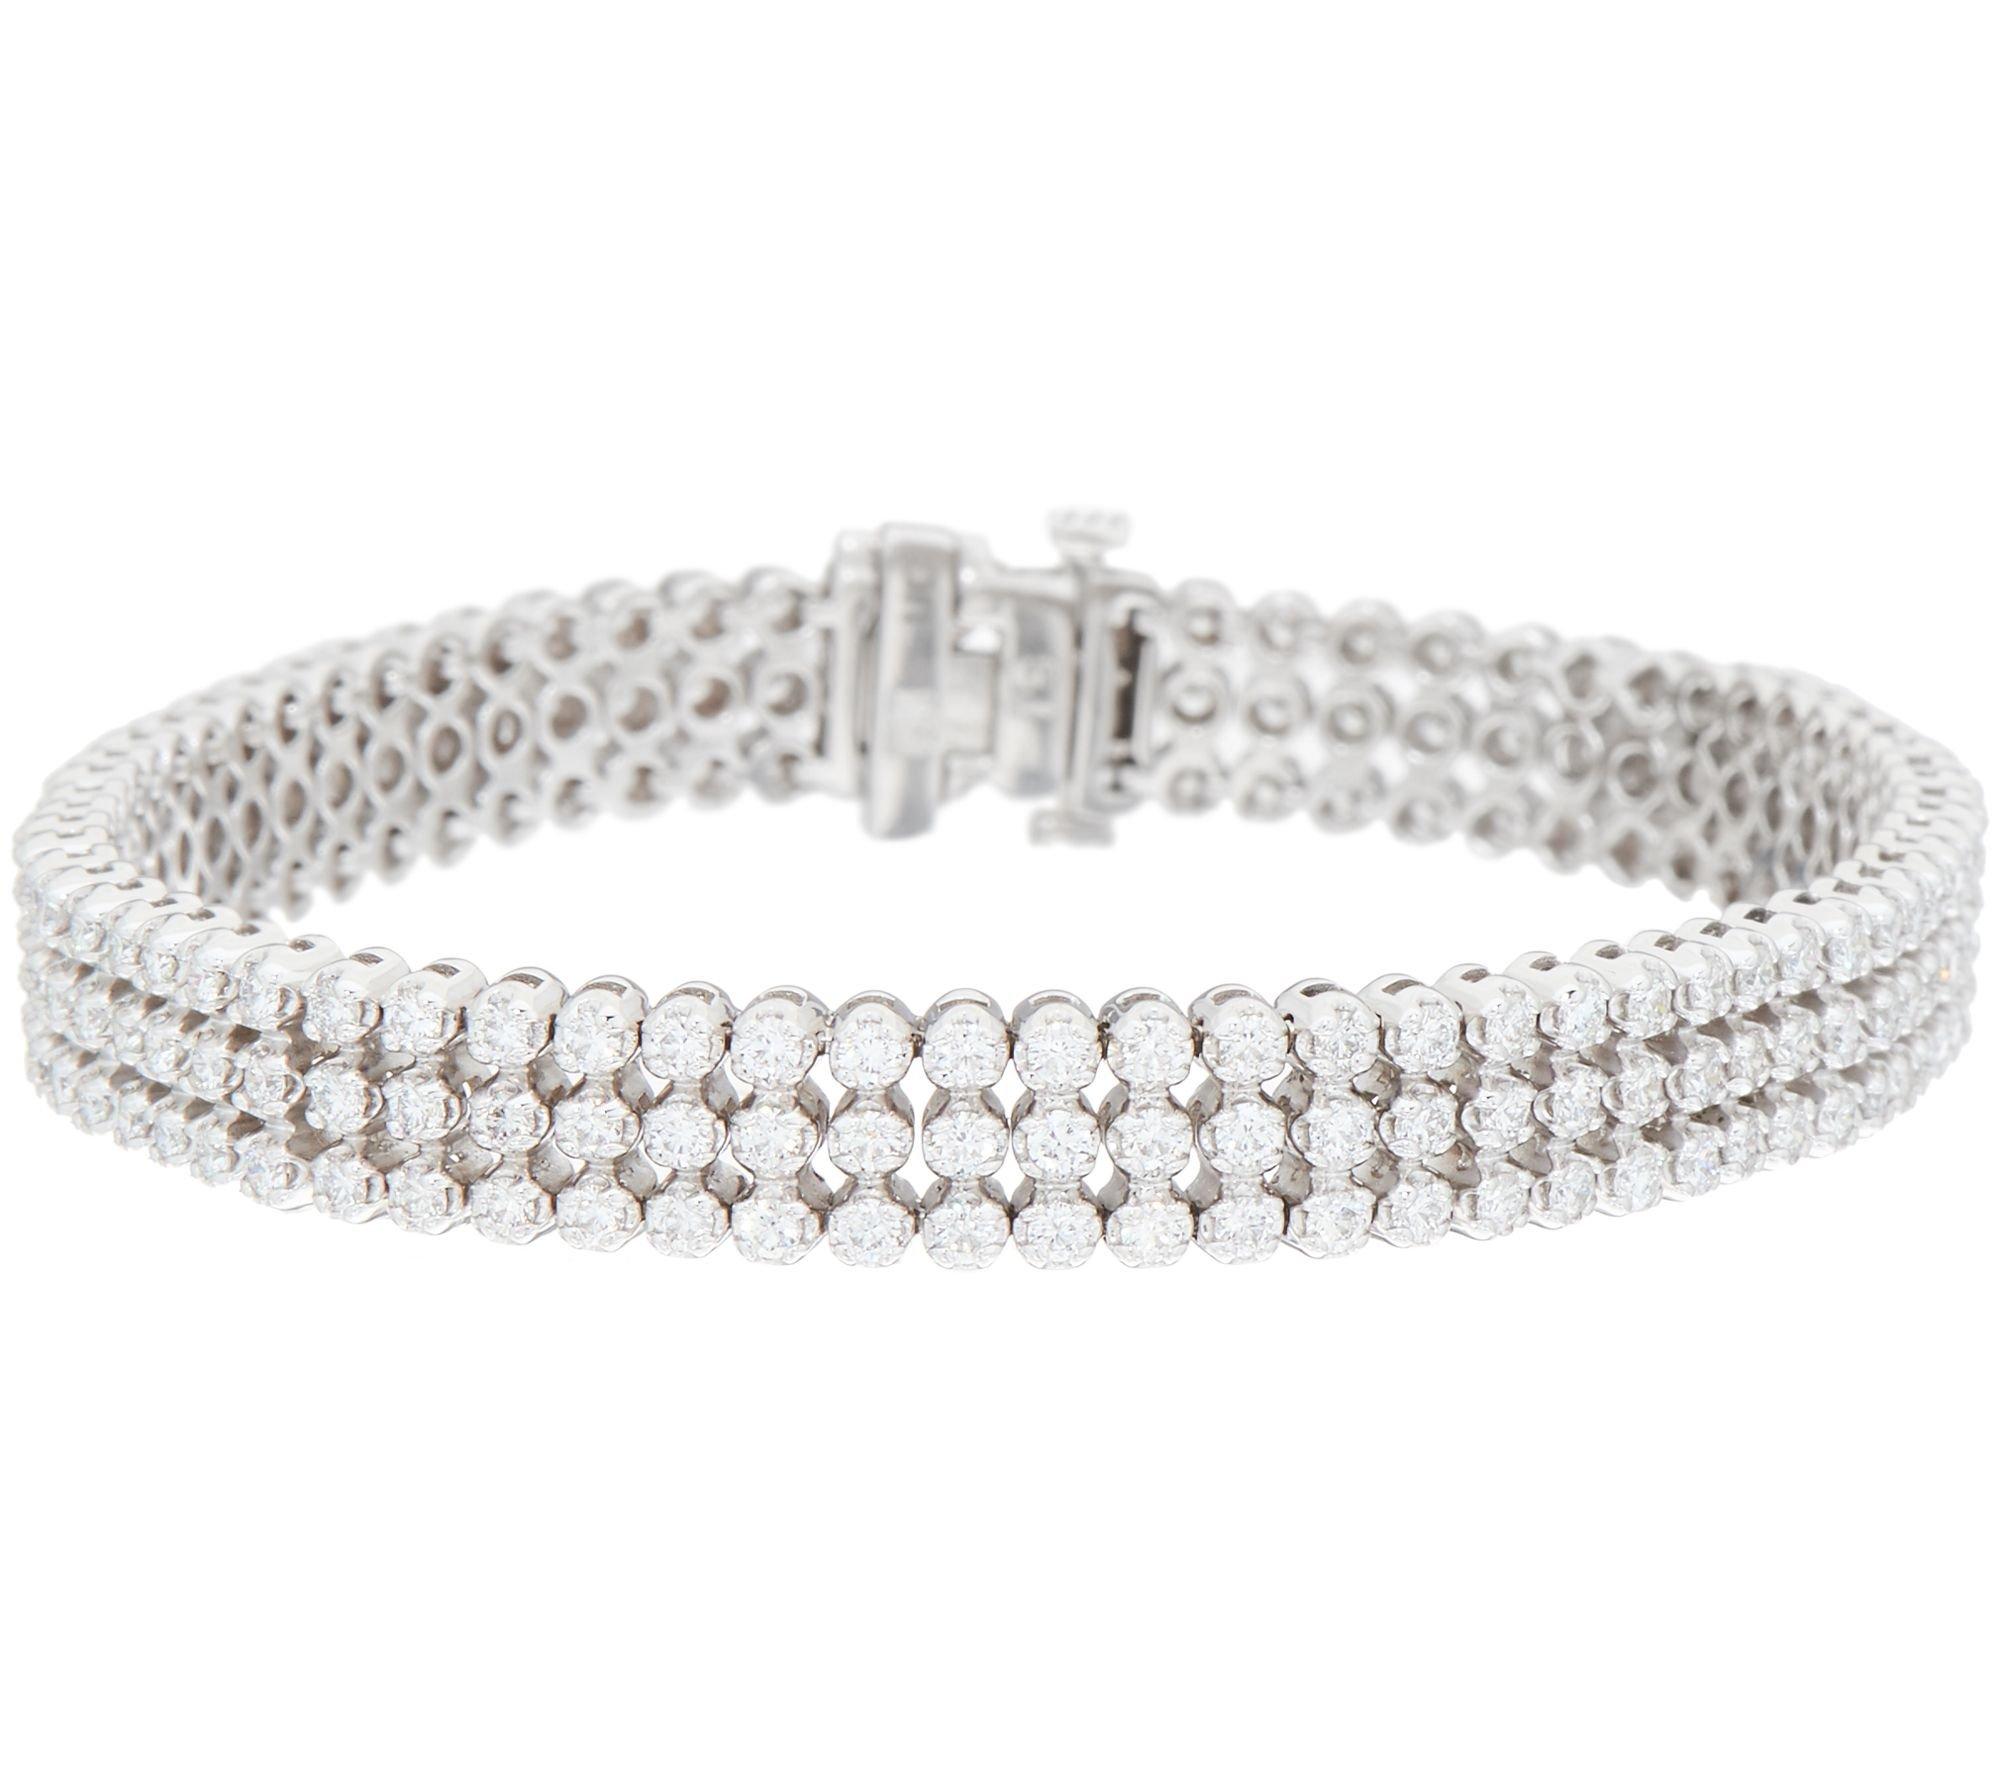 Silvostyles 4.60 Cttw Triple Row D/VVS1 Diamond Tennis Bracelet In 14K White Gold Plated by Silvostyles